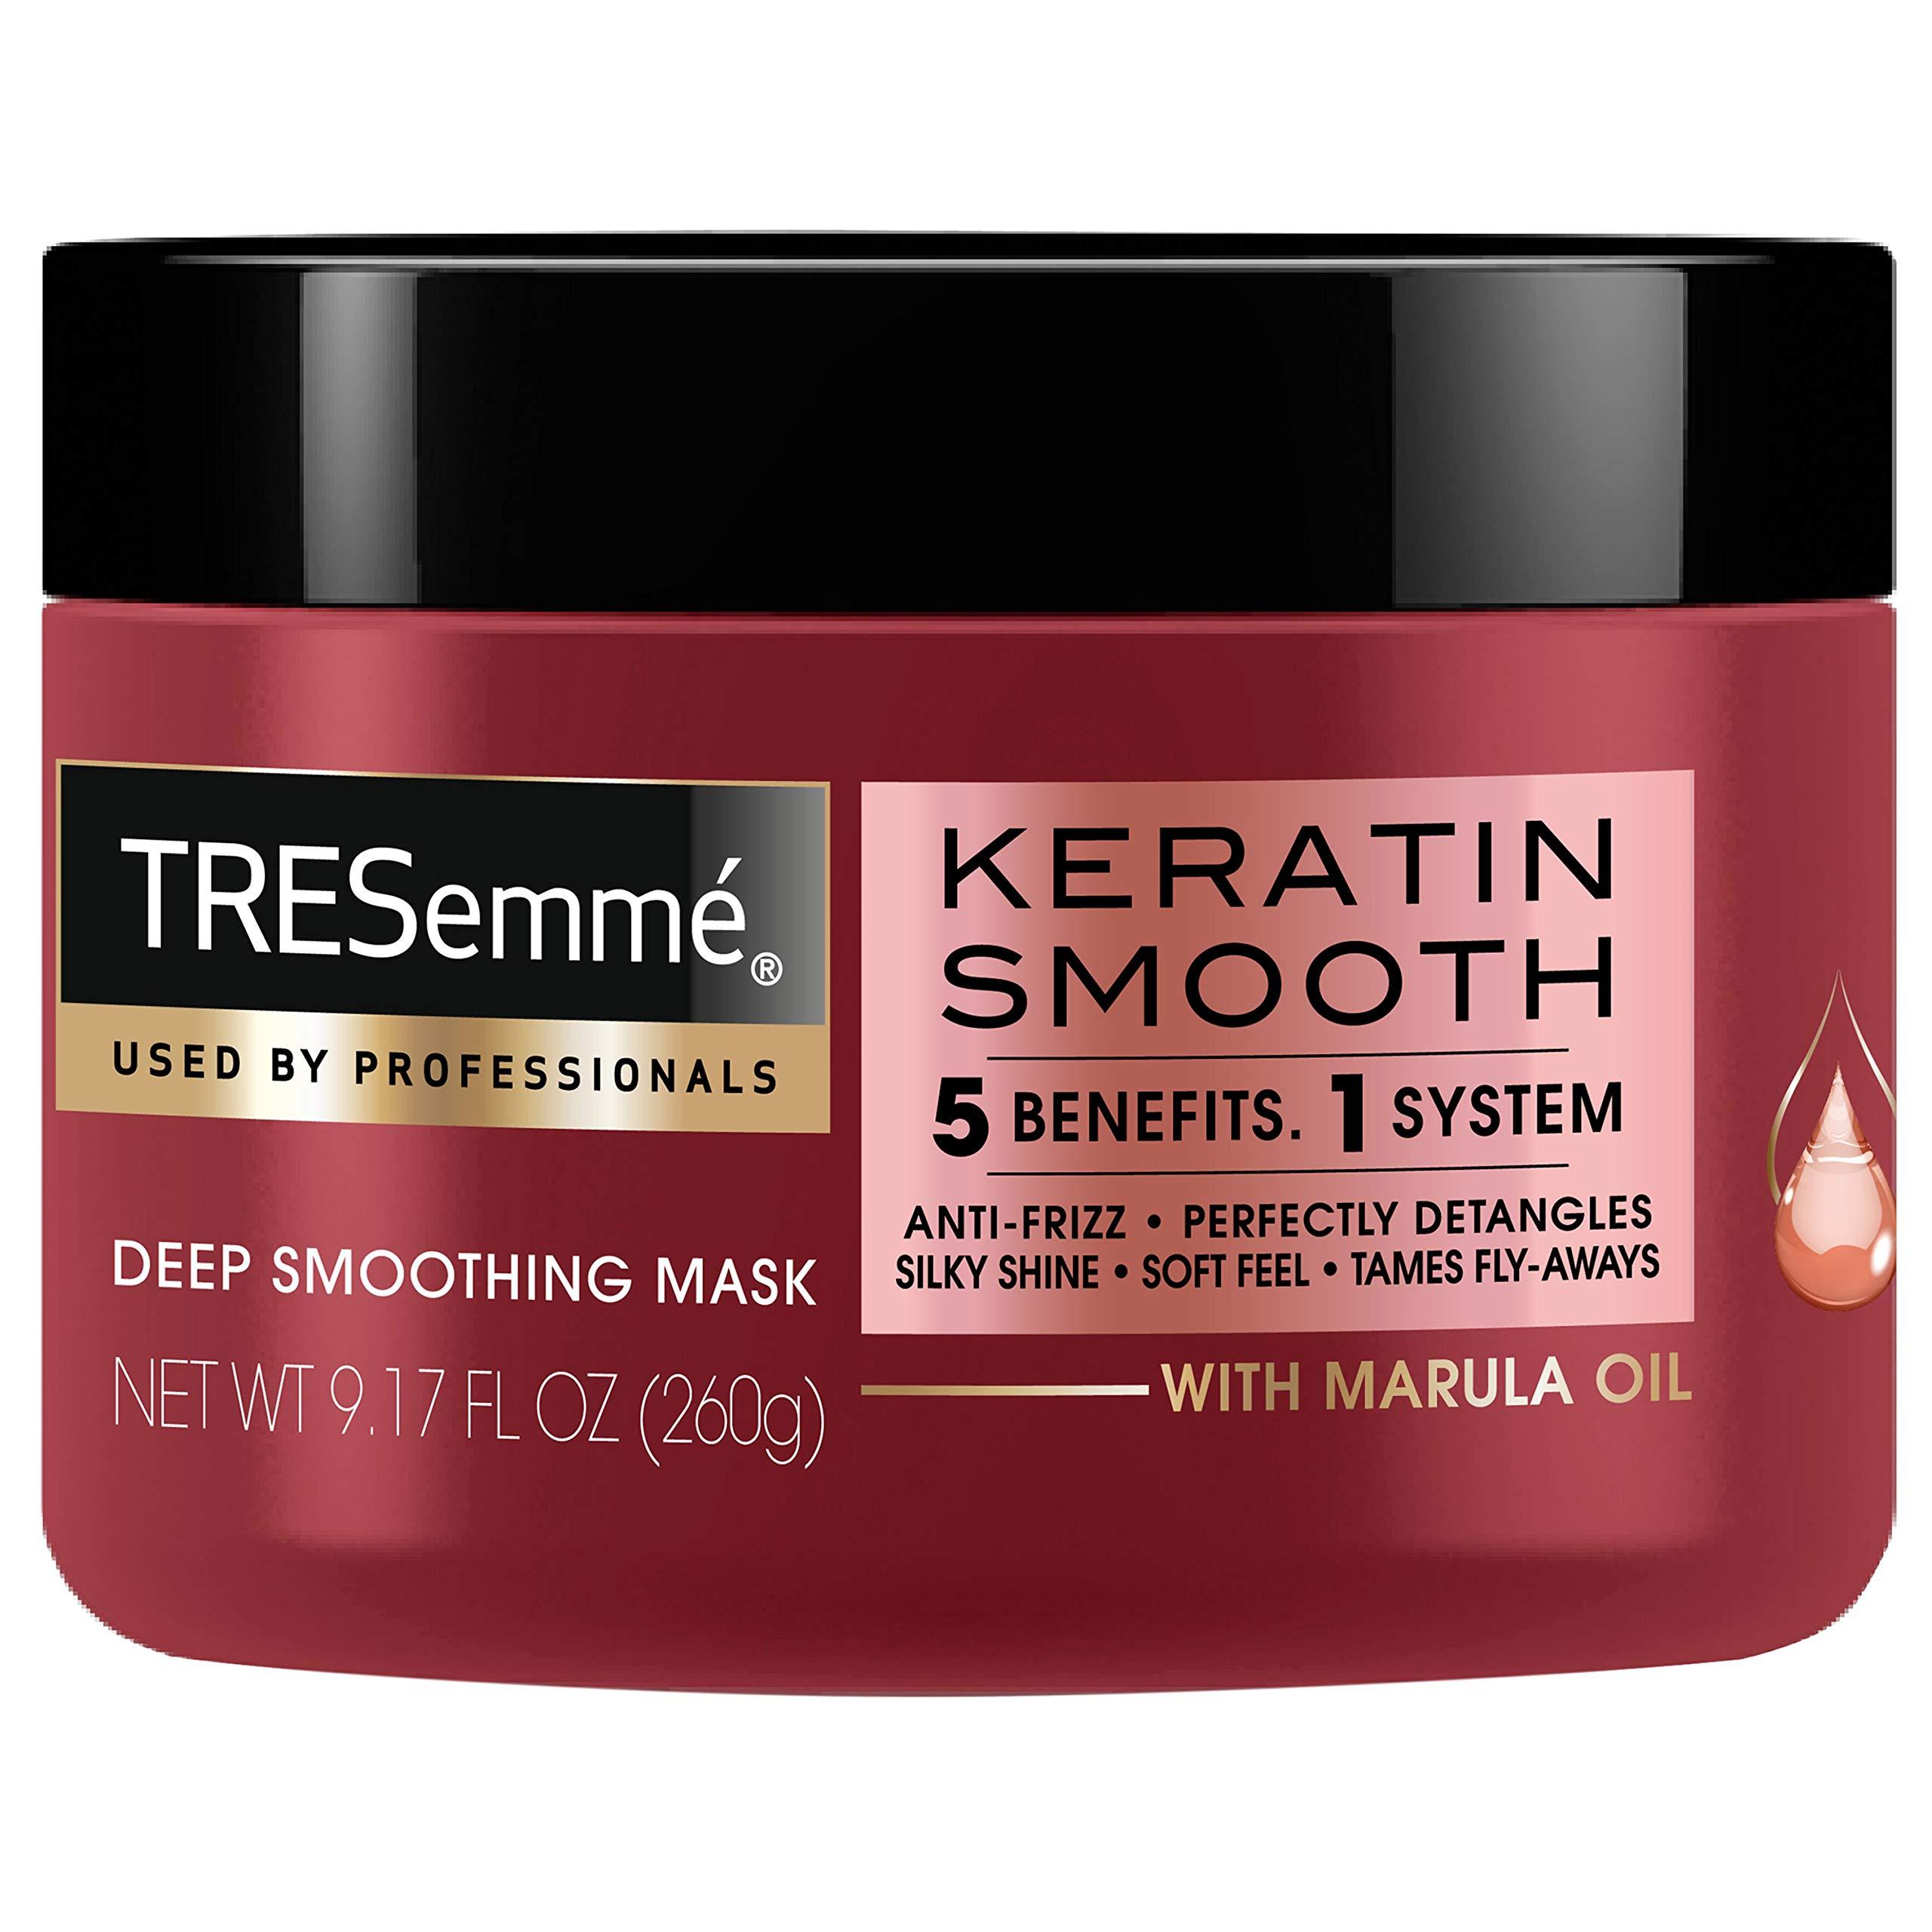 TRESemmé Expert Selection Hair Mask, Keratin Smooth, 9 oz